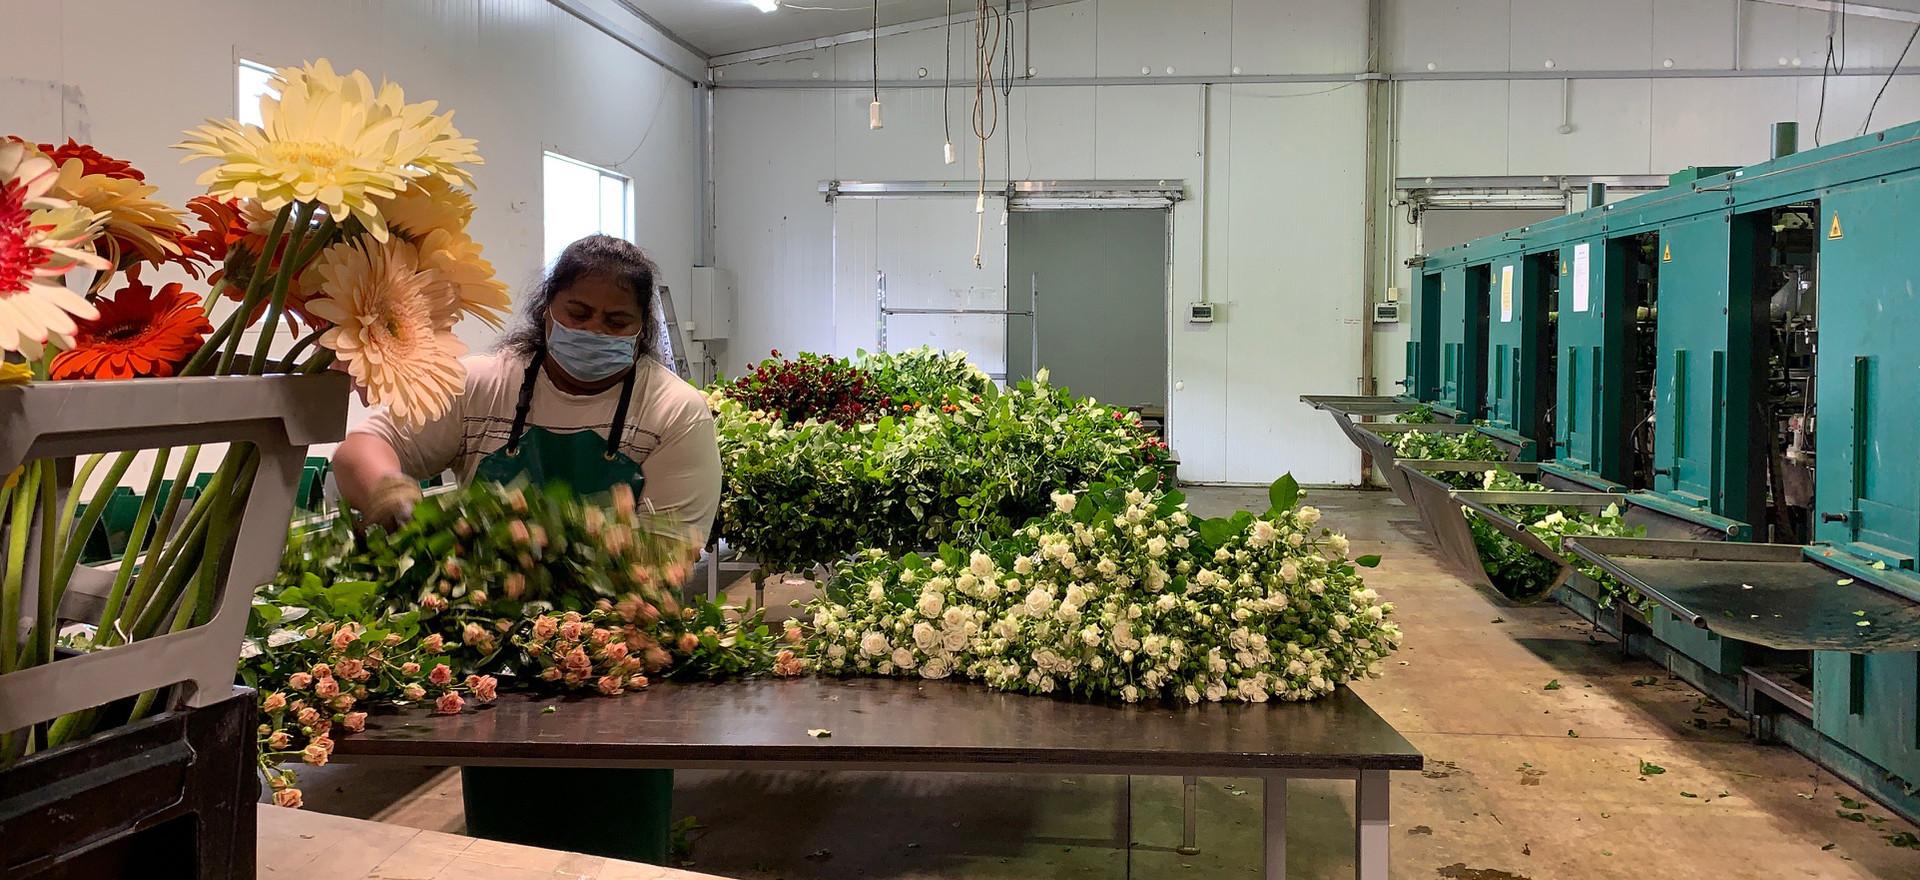 Taareta sorting flowers